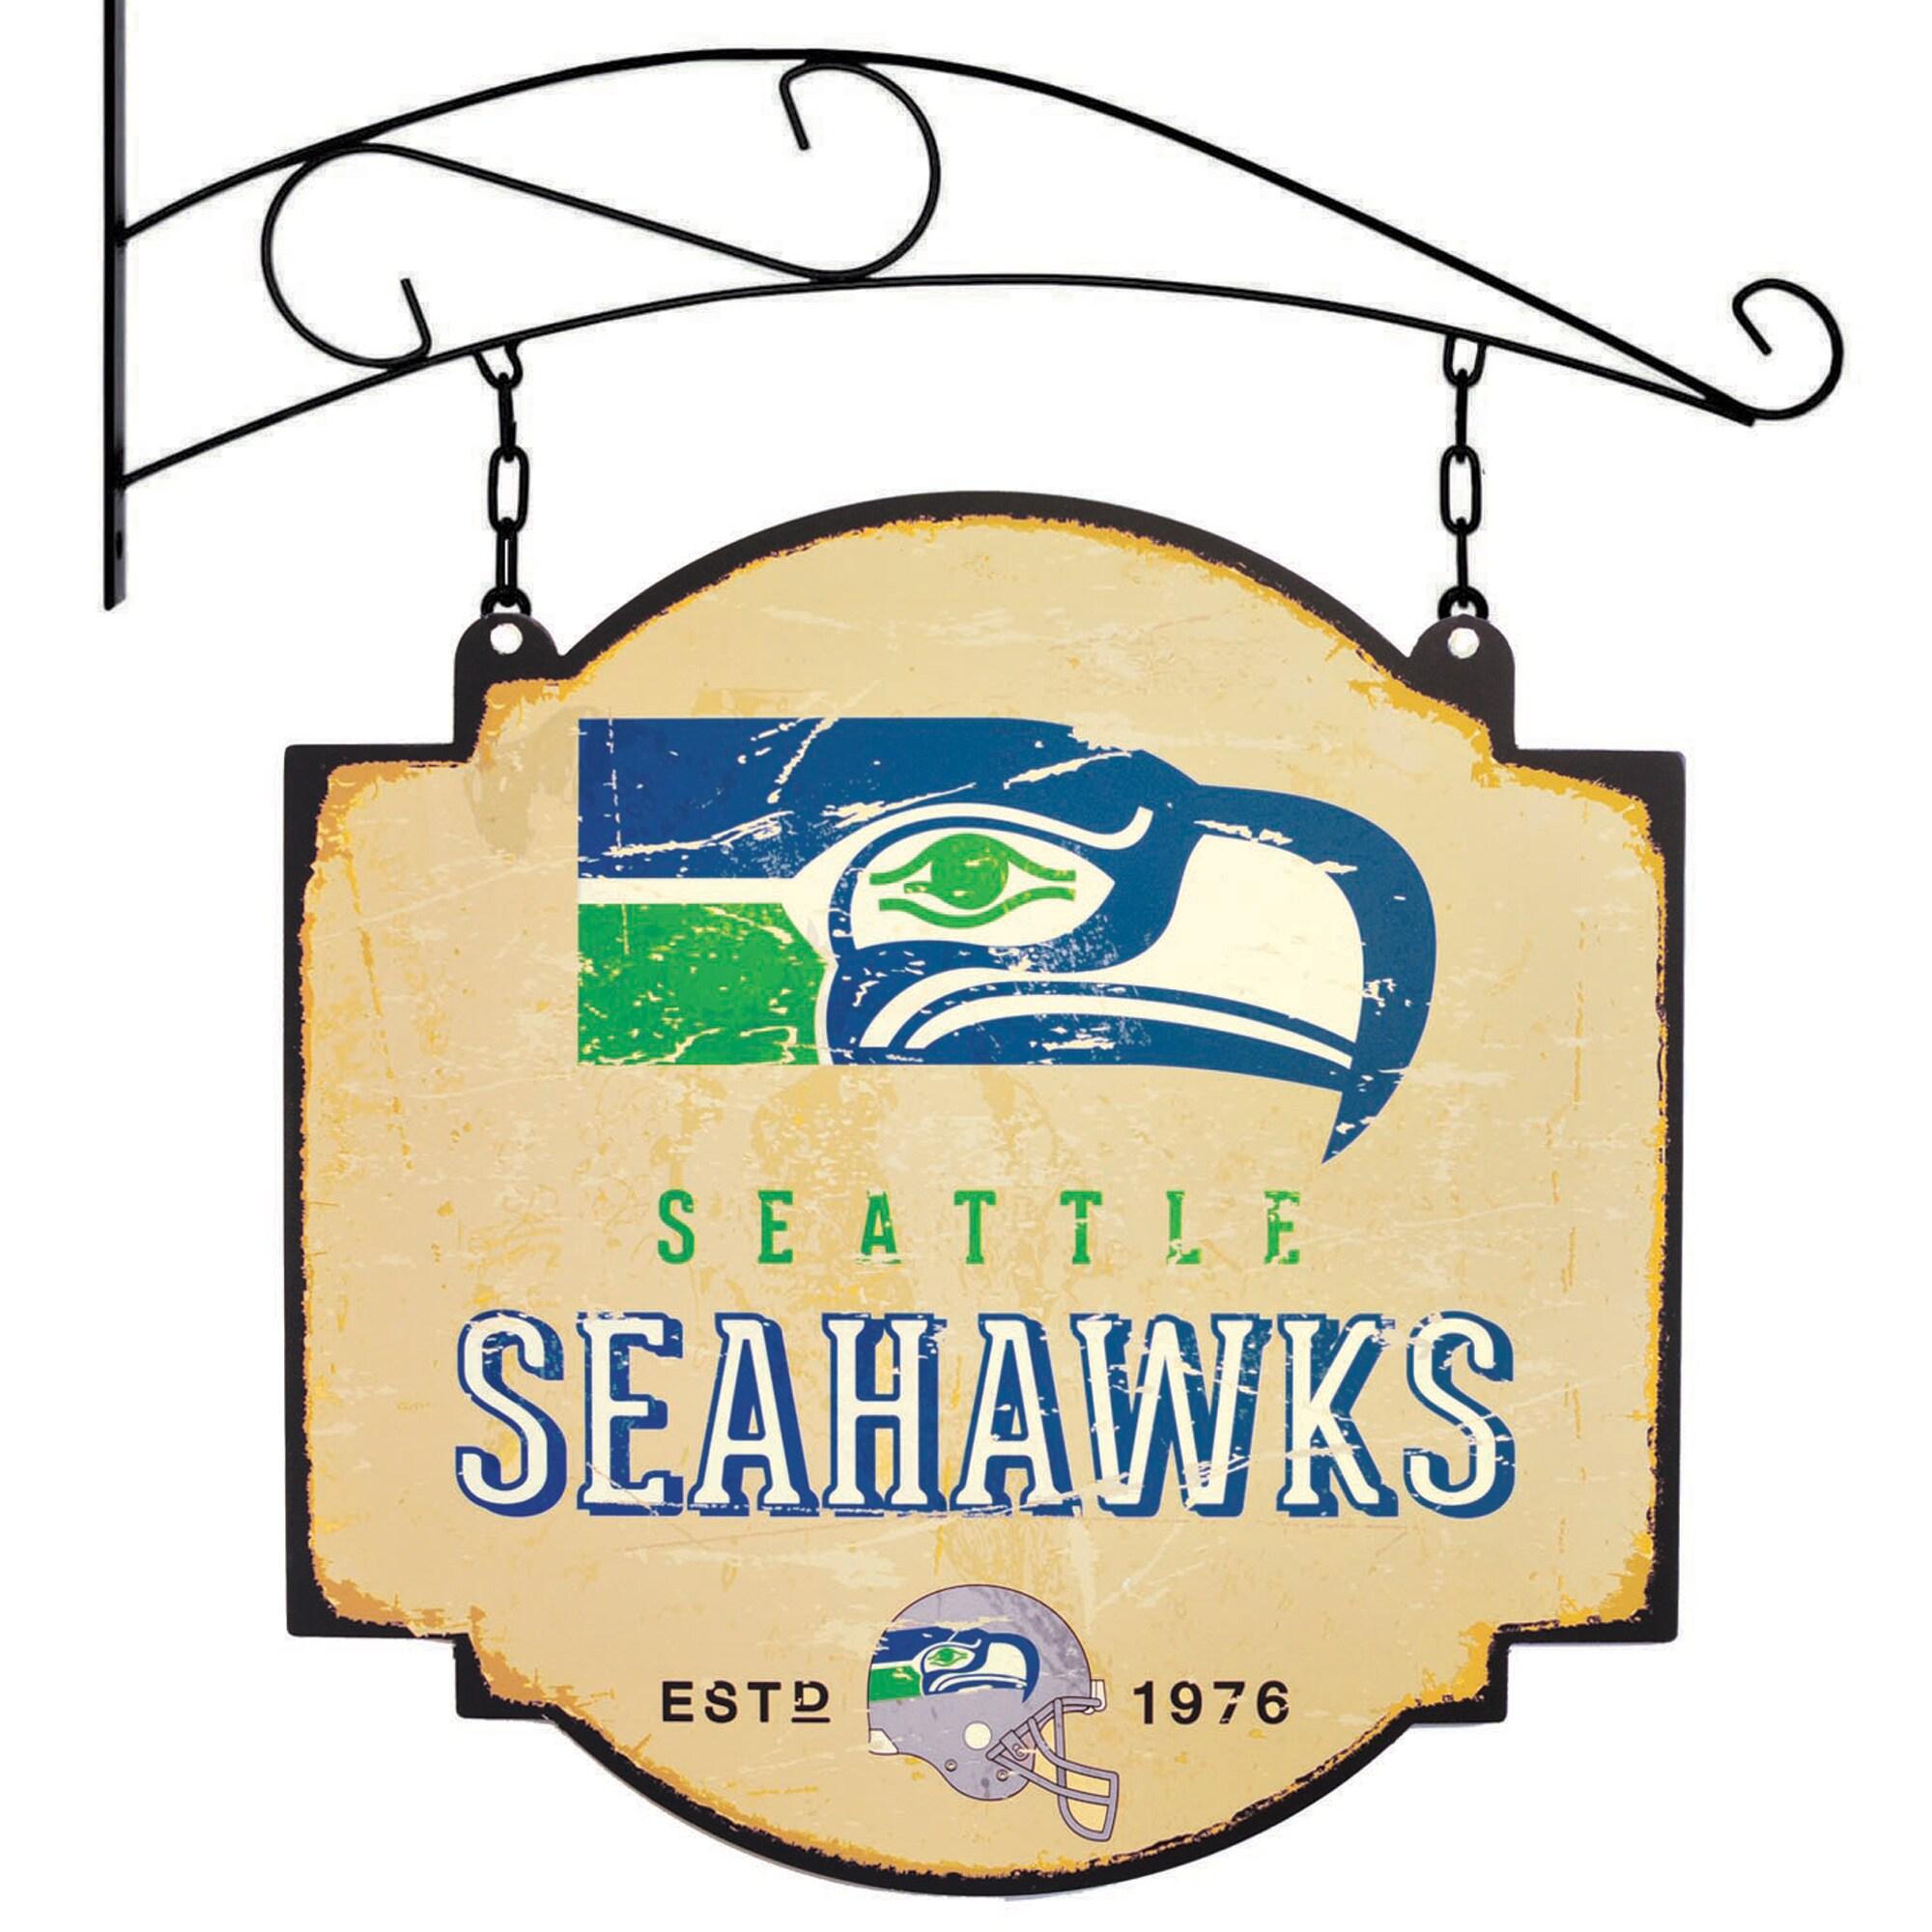 "Seattle Seahawks 16"" x 16"" Tavern Sign - Cream"